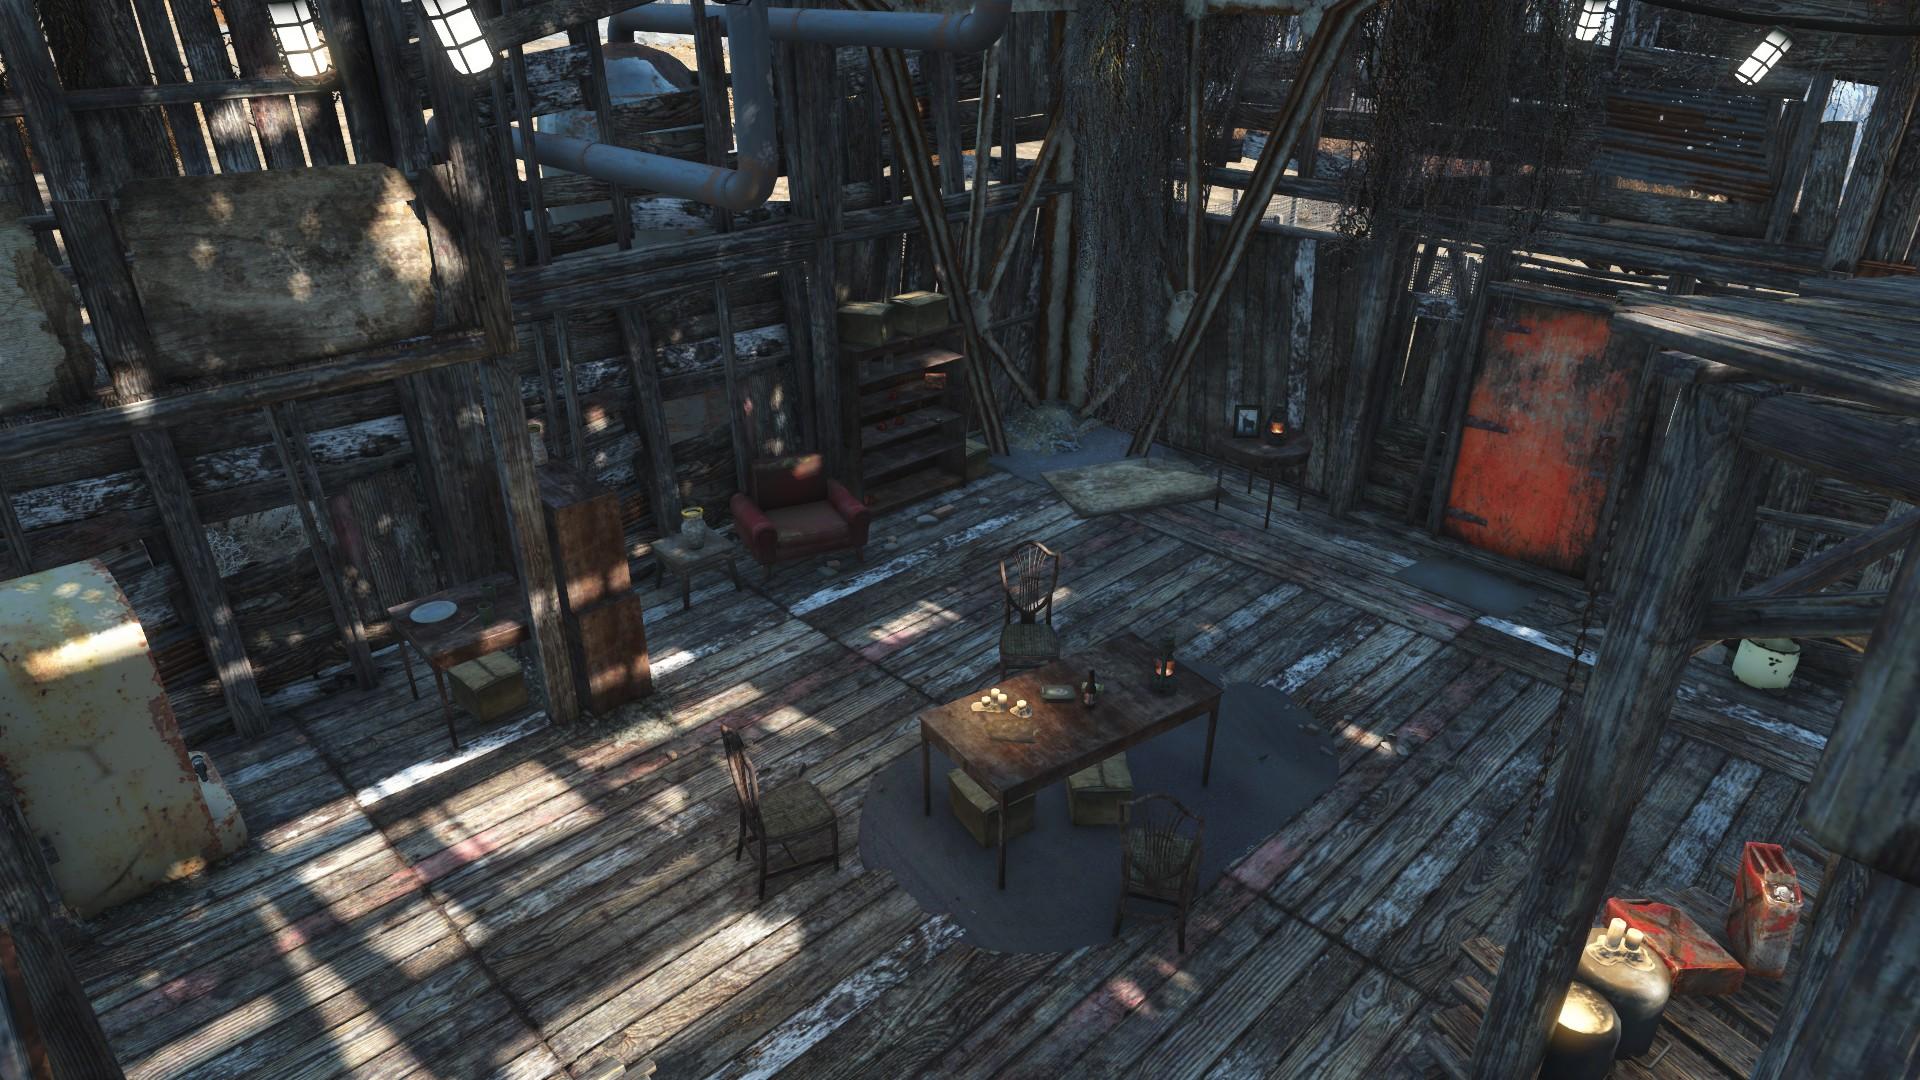 Abernathy farm interior